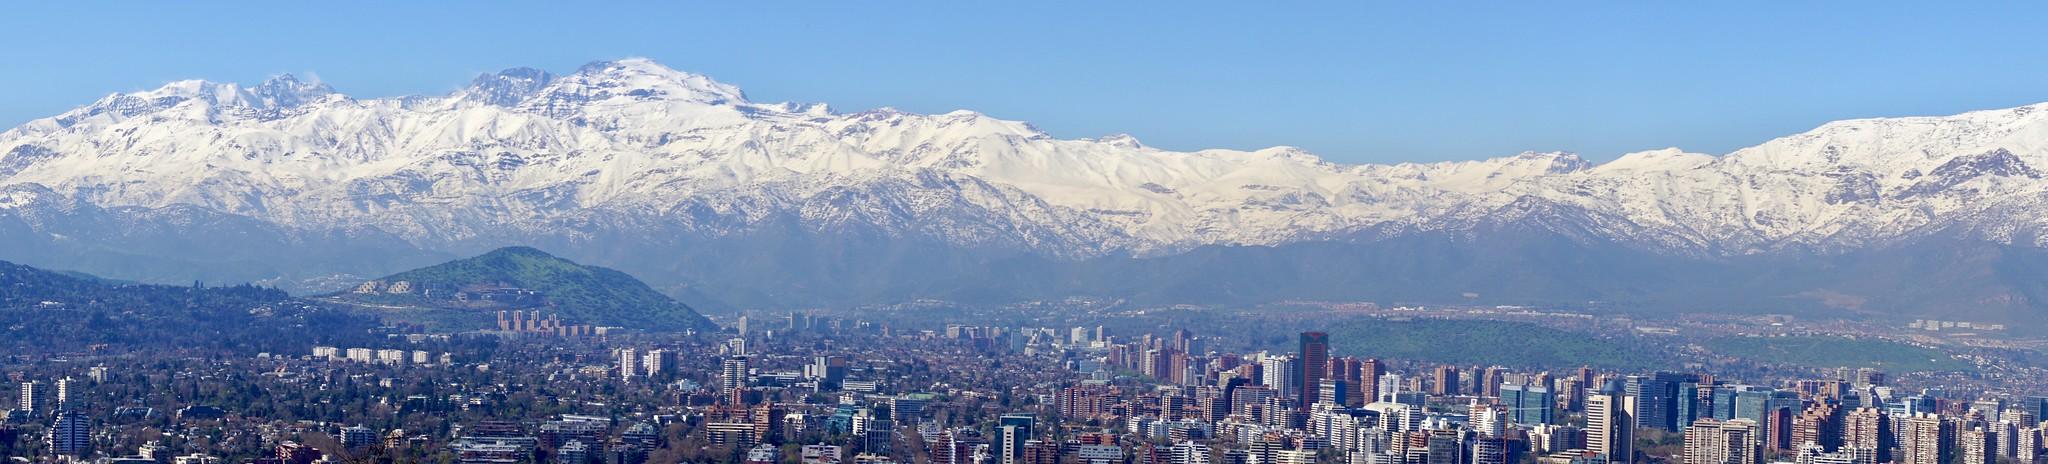 Panoramic photo of Santiago Chile